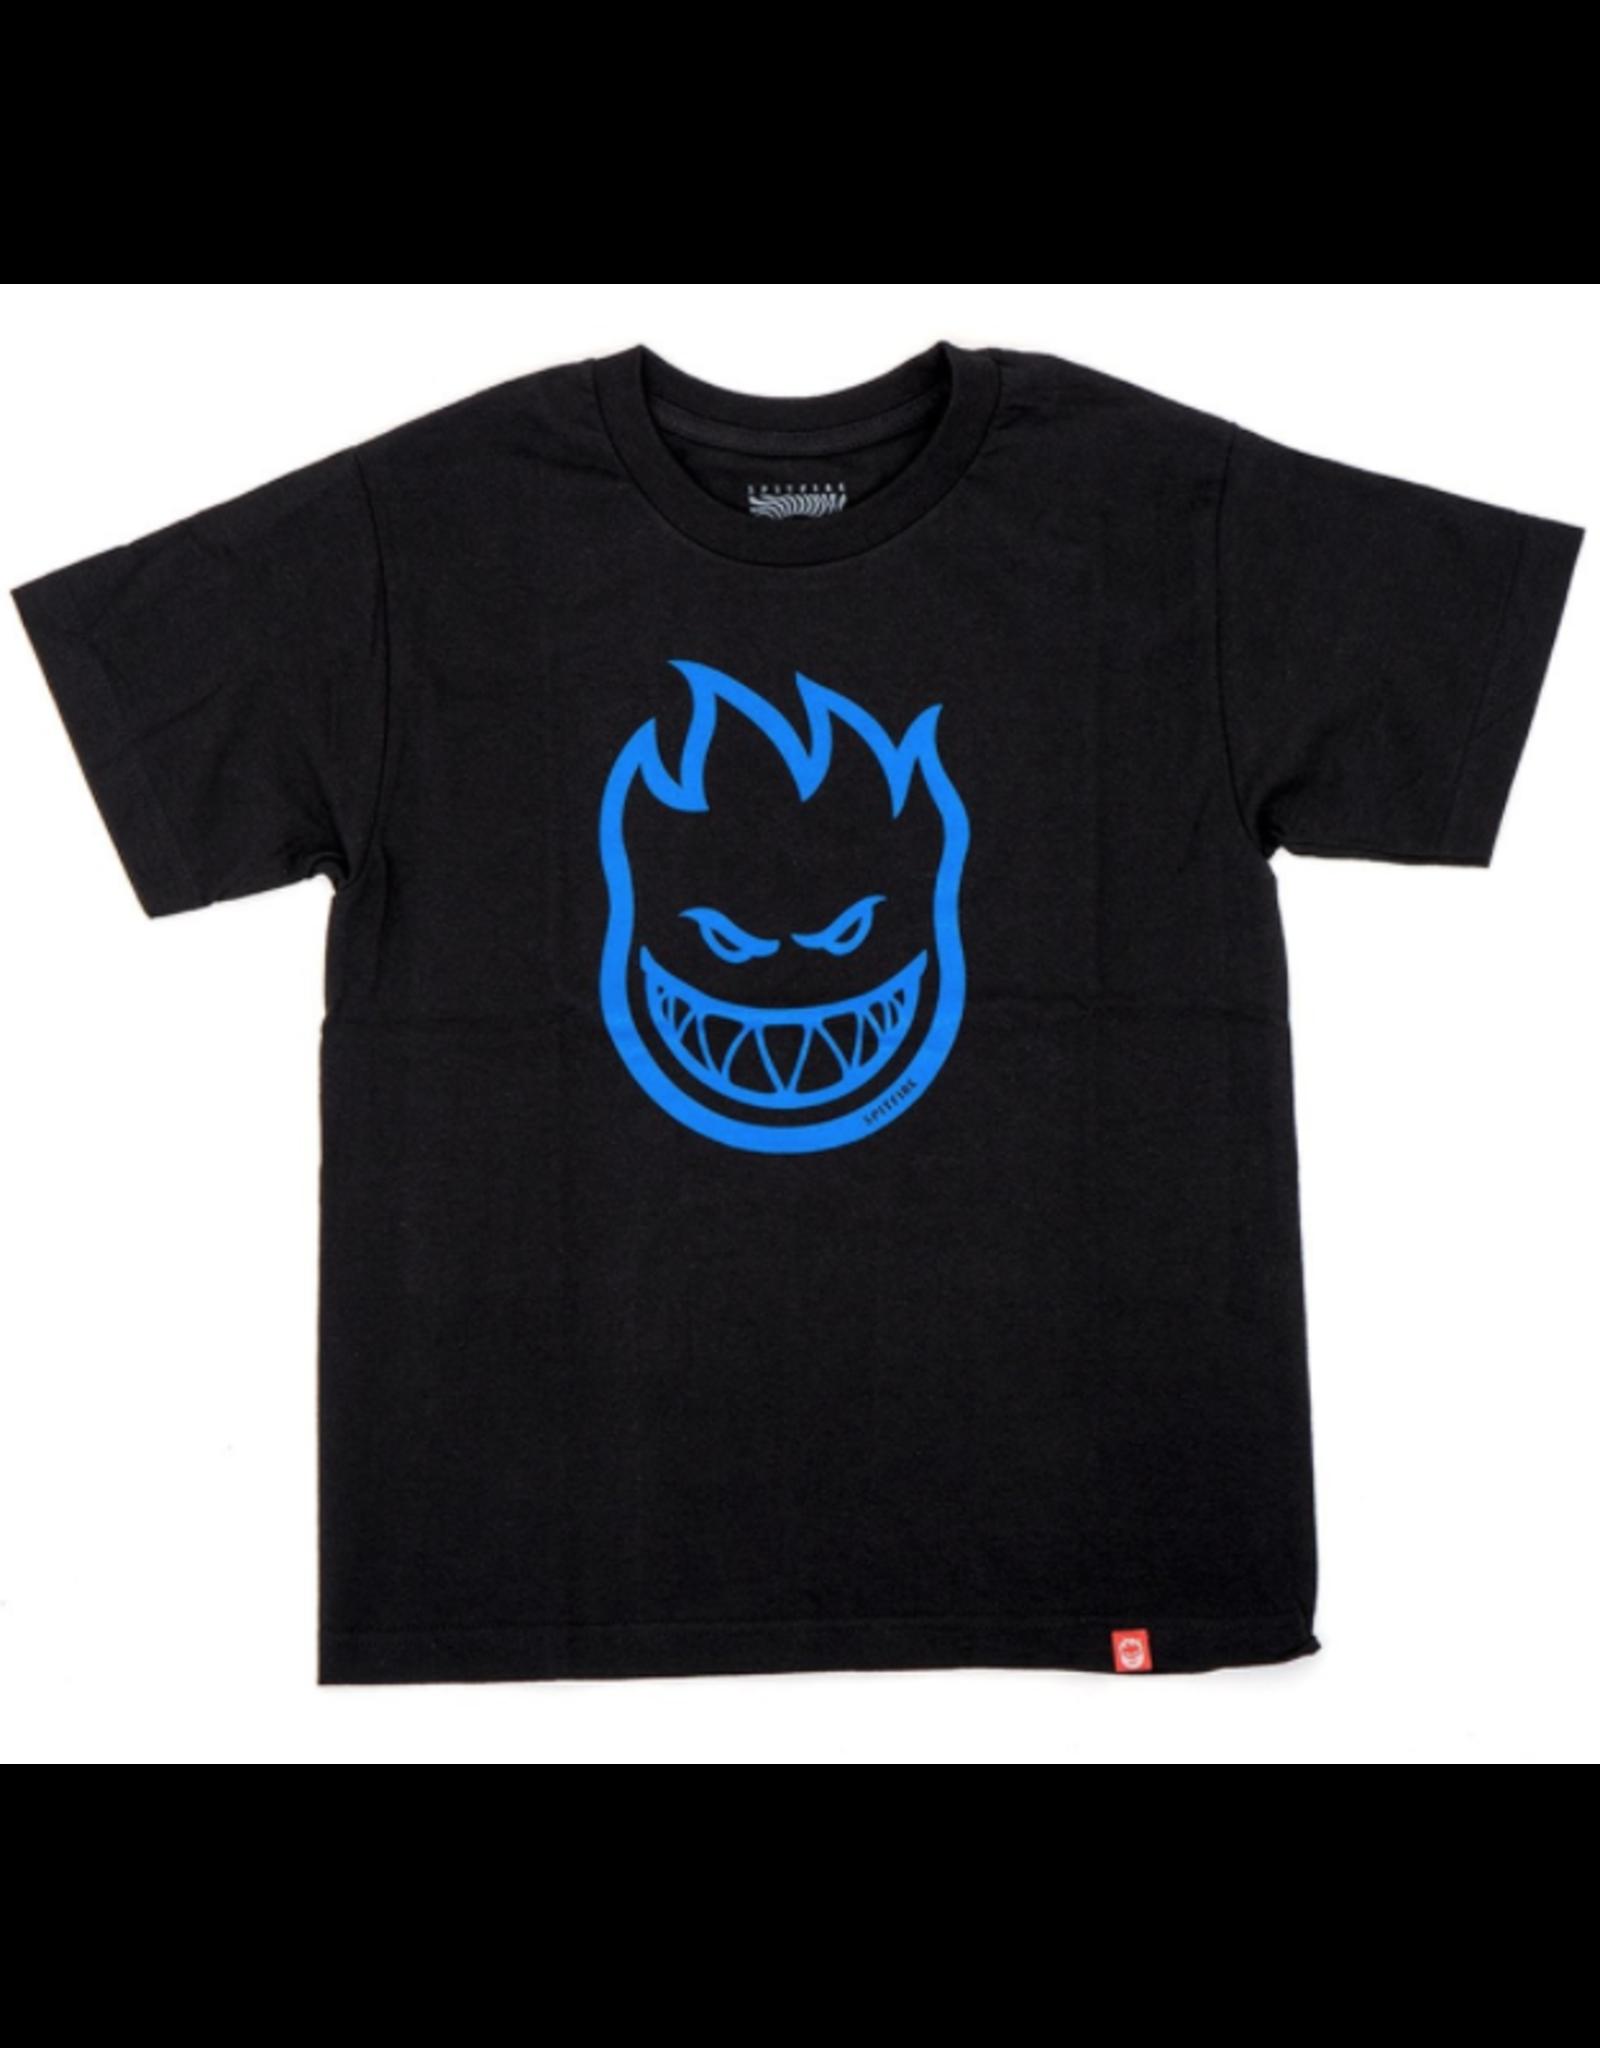 Spitfire Bighead Youth T-Shirt - Black